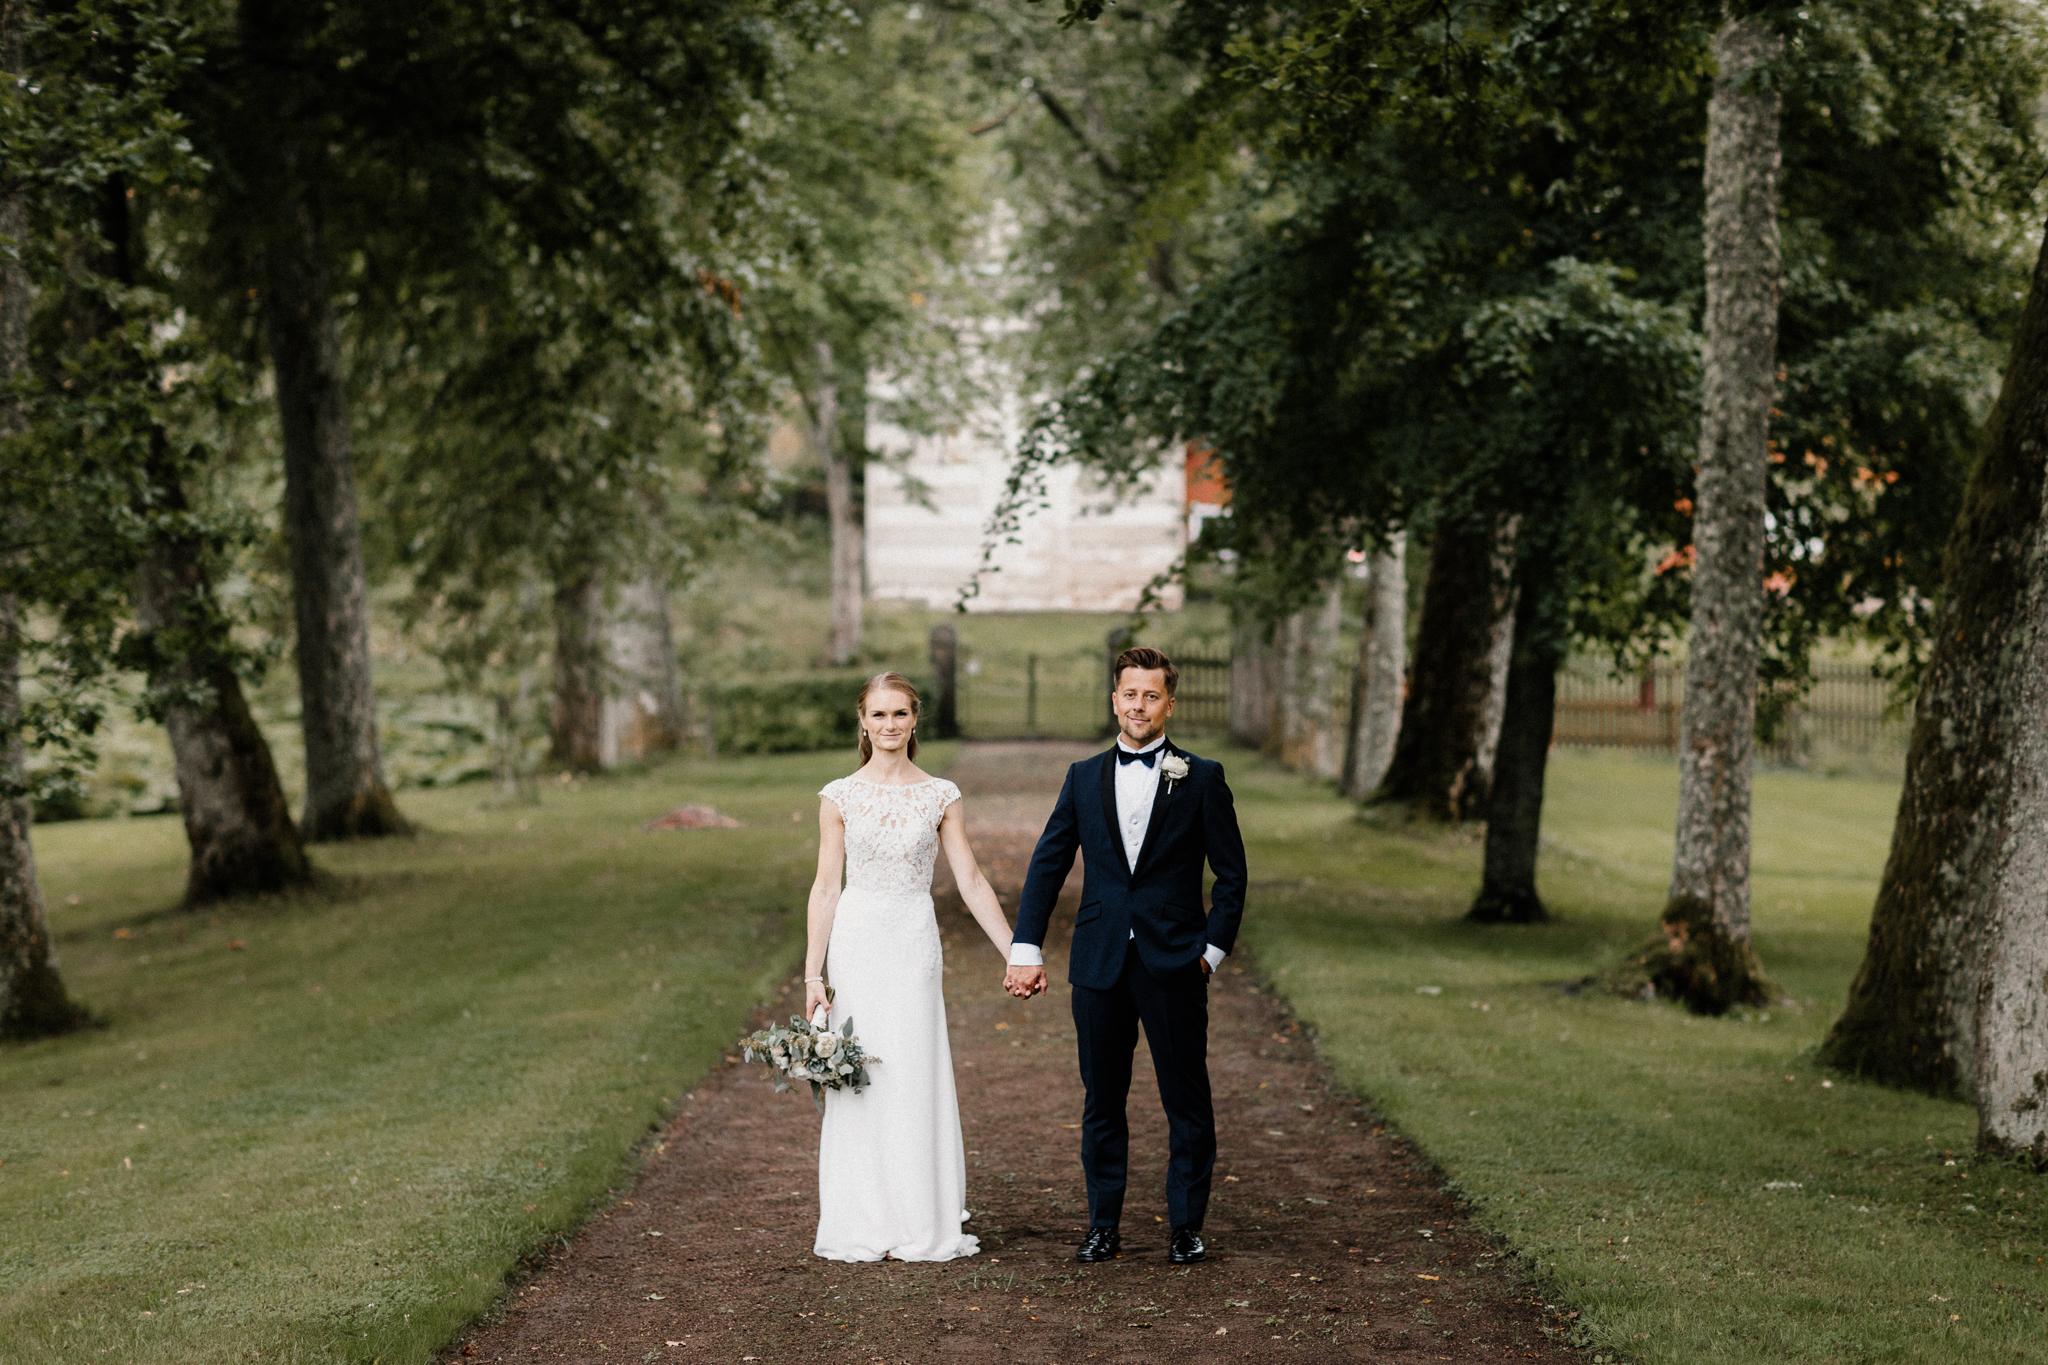 Jessica + Patrick | Fagervik | by Patrick Karkkolainen Wedding Photography-43.jpg